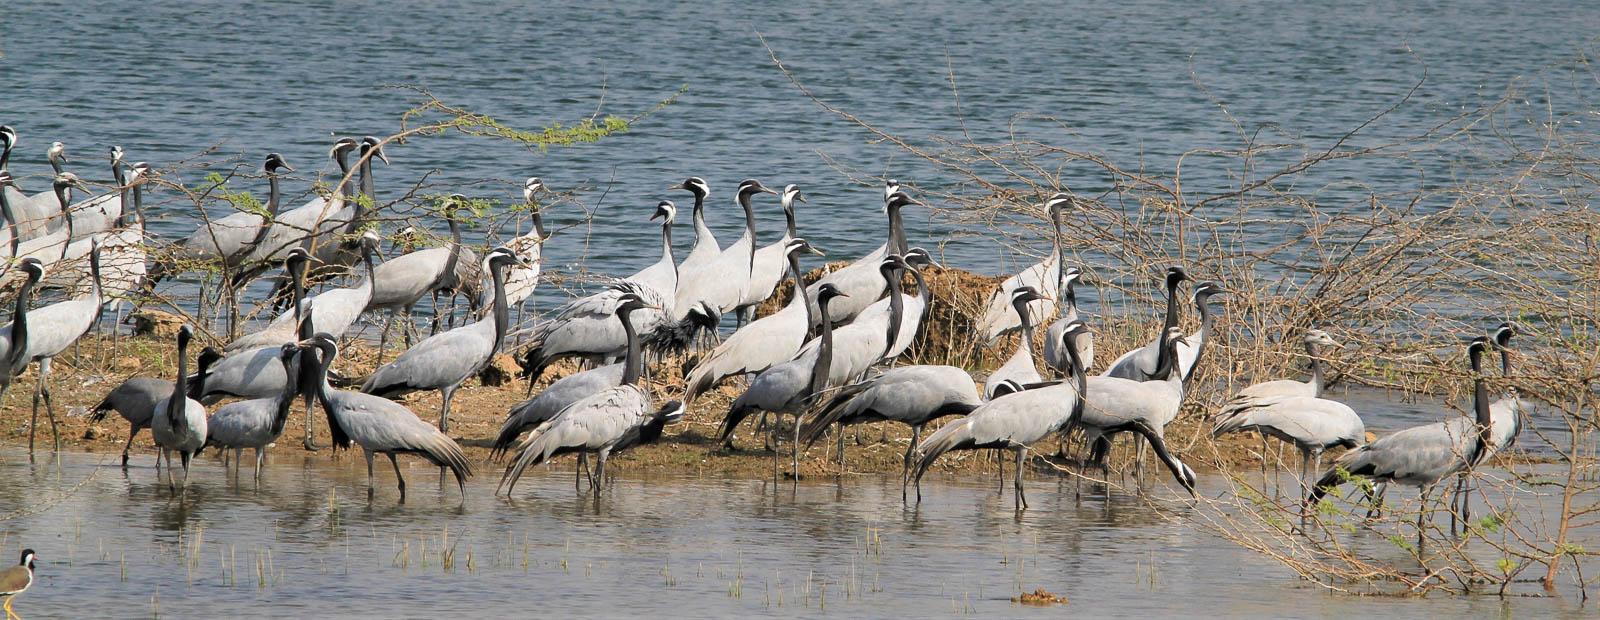 1102_Dwarka-birds-111.jpg